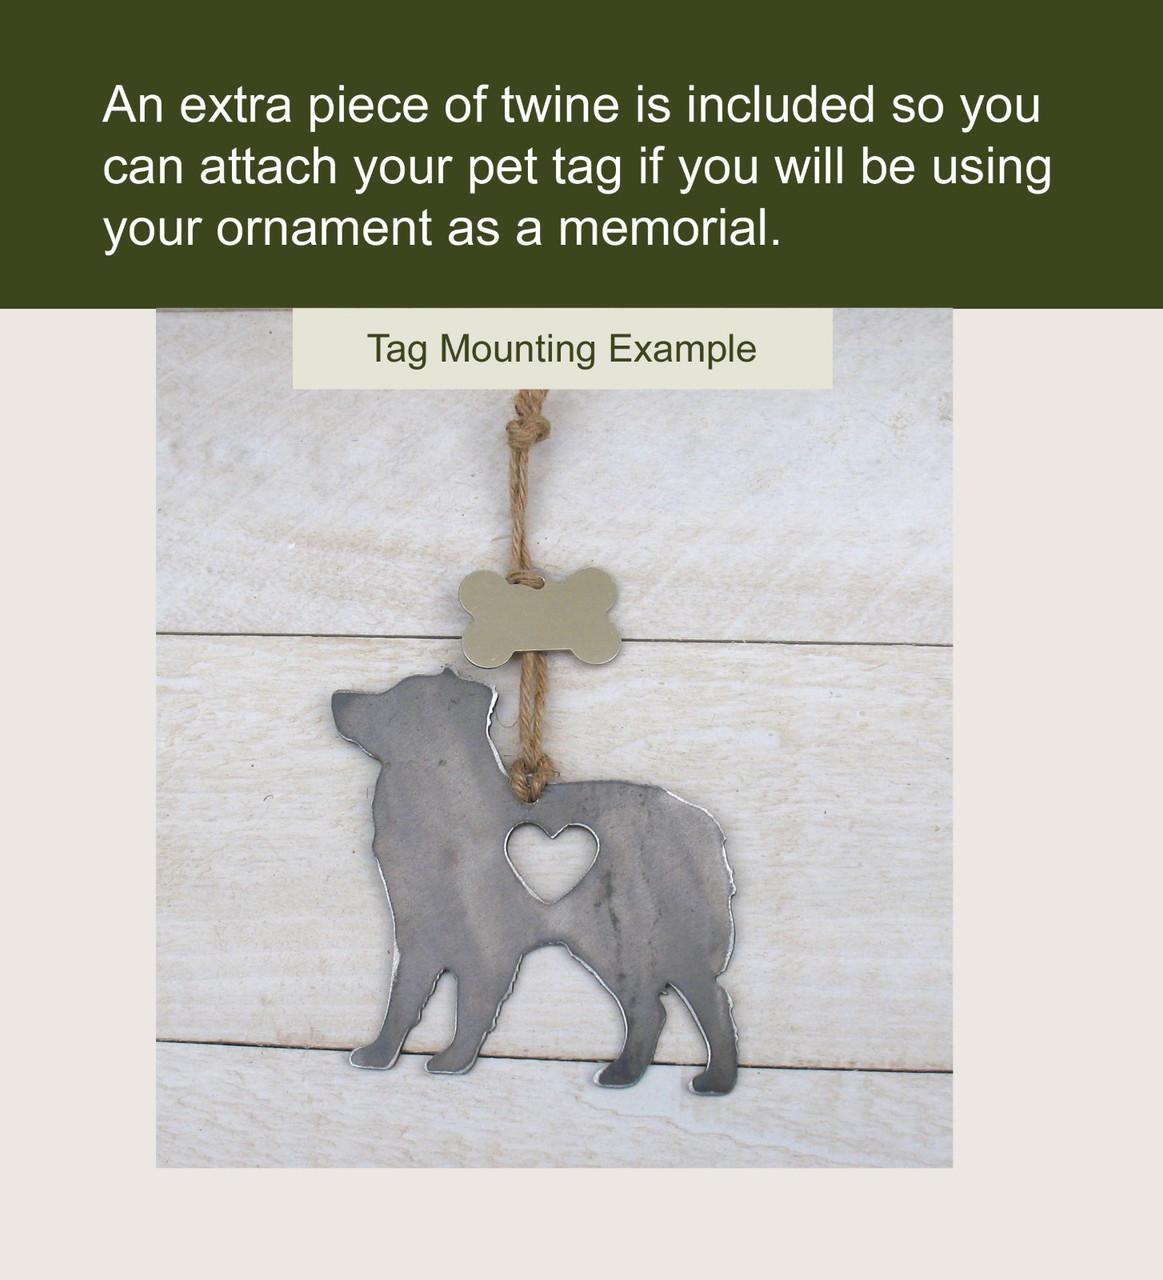 Maltese Dog 2 Pet Loss Gift Ornament - Pet Memorial - Dog Sympathy Remembrance Gift - Metal Dog Christmas Ornament